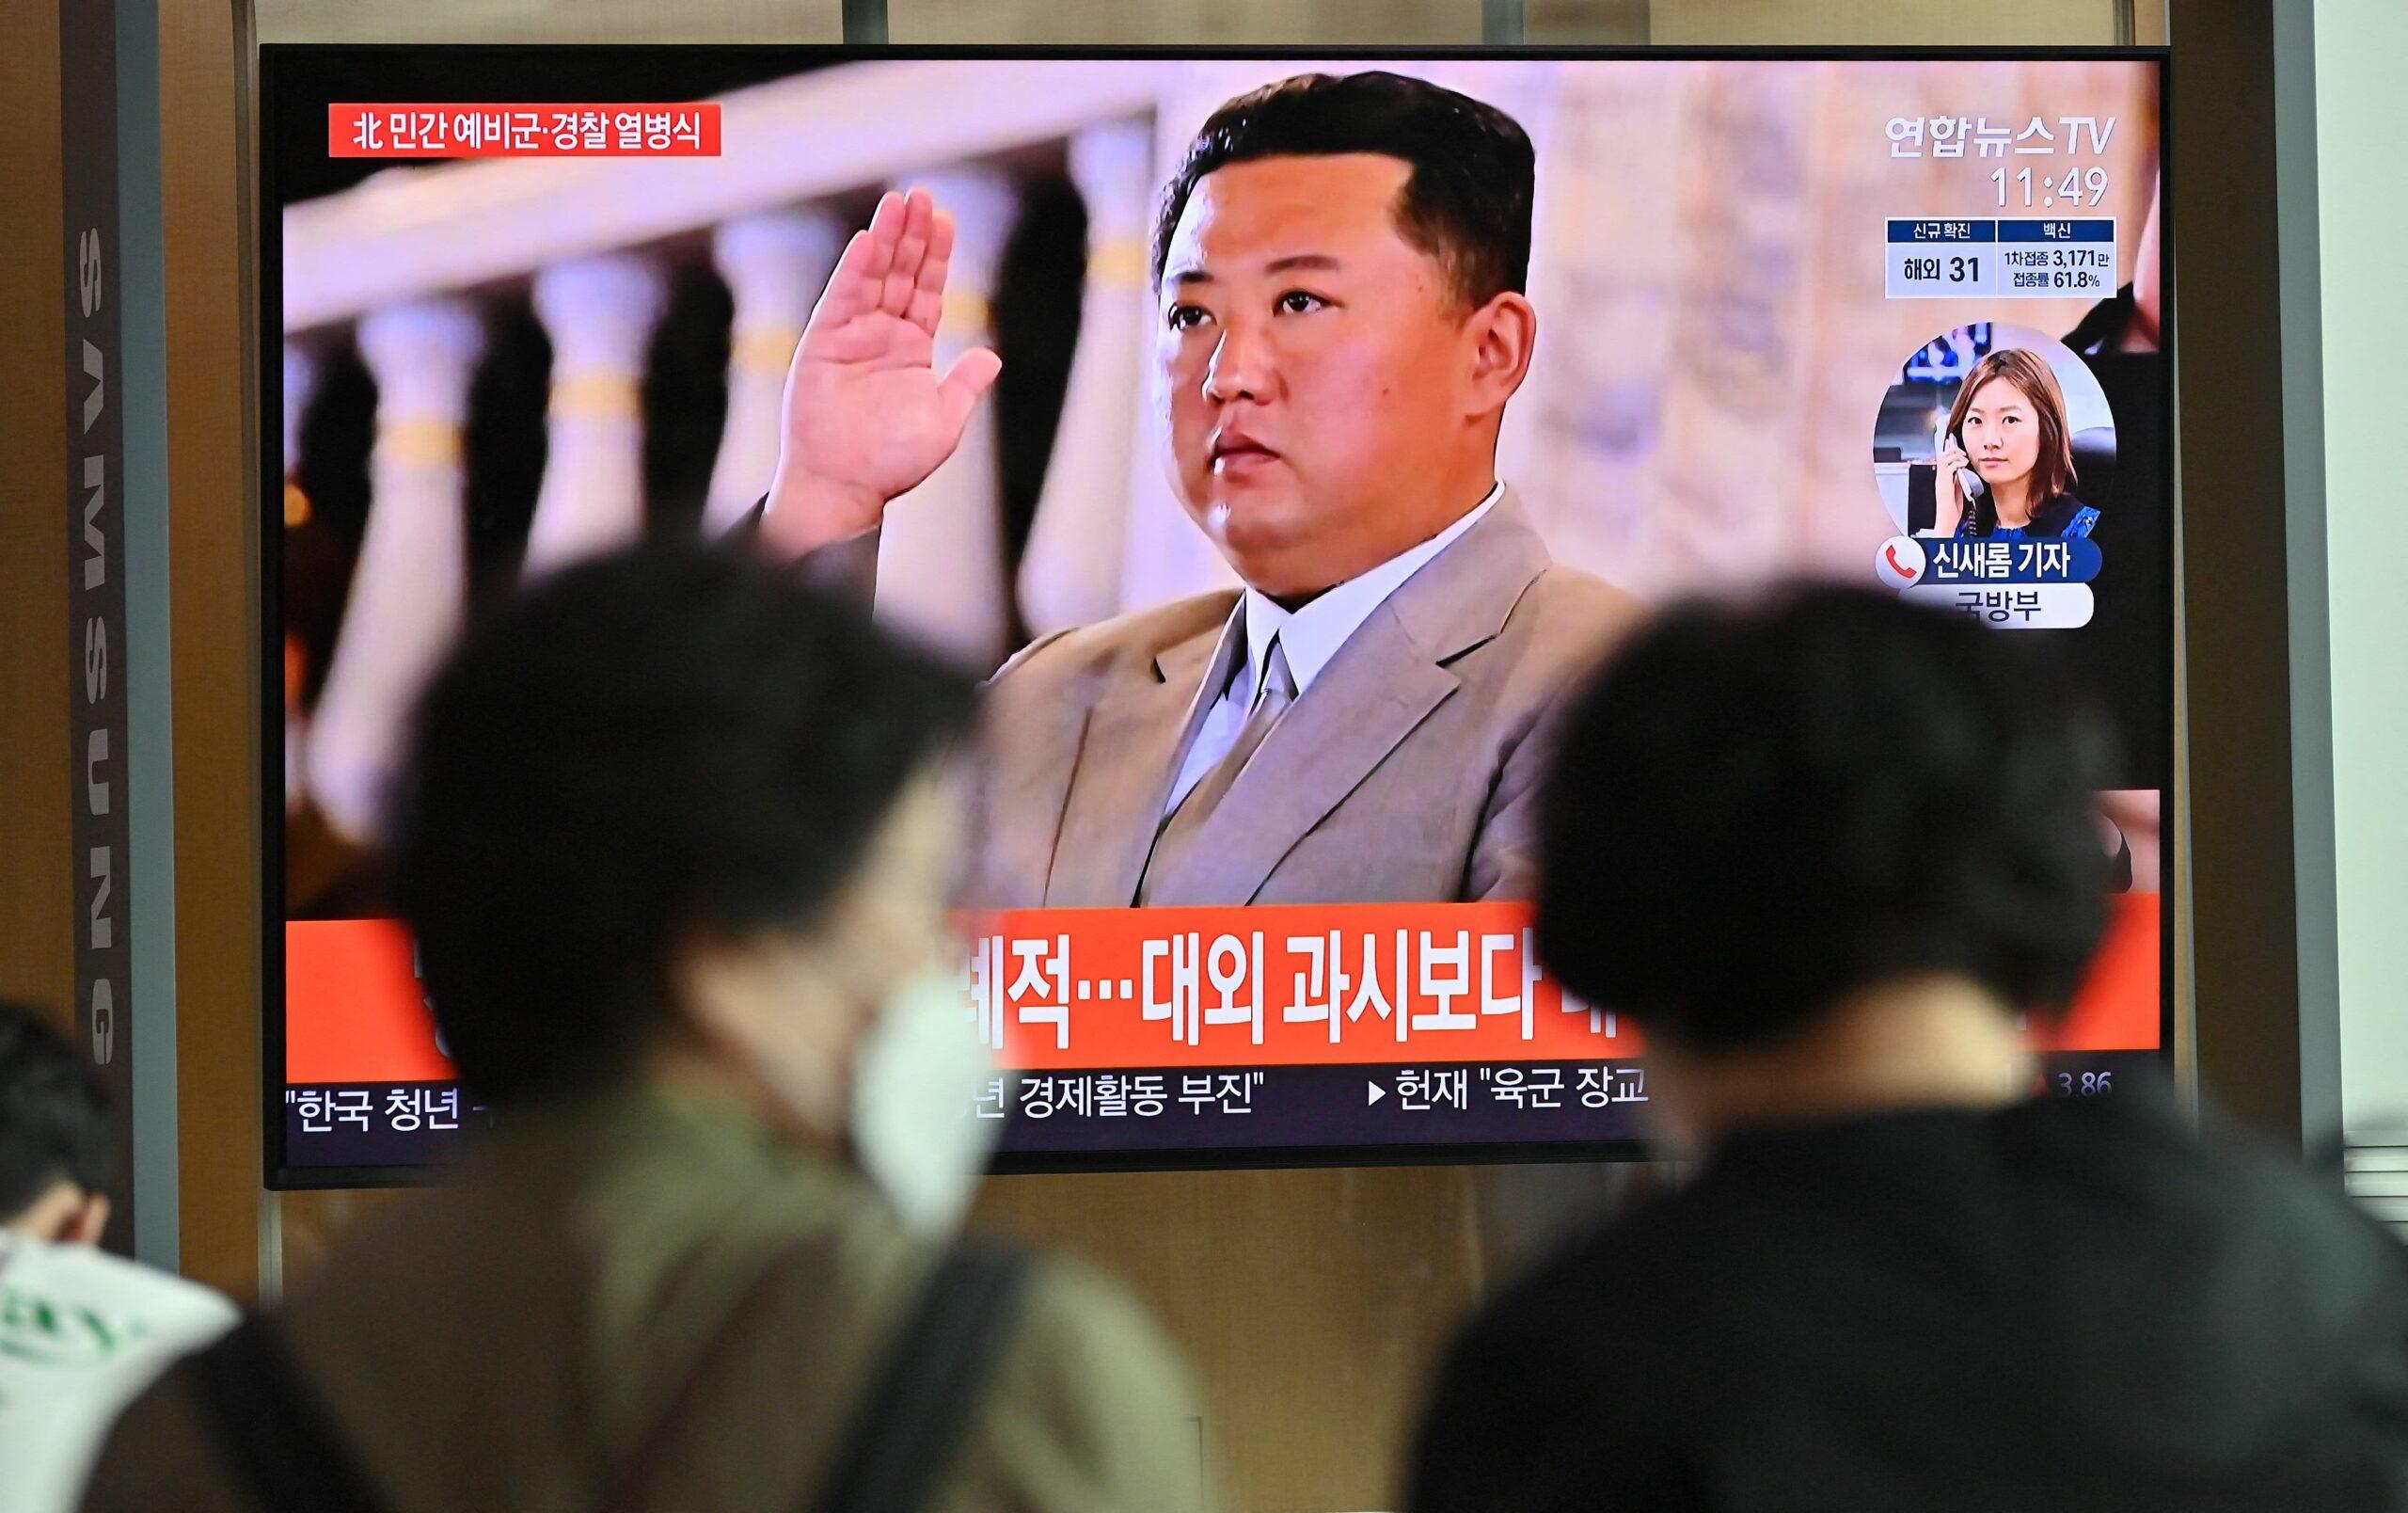 North Korea fired 2 ballistic missiles off east coast, South Korea says